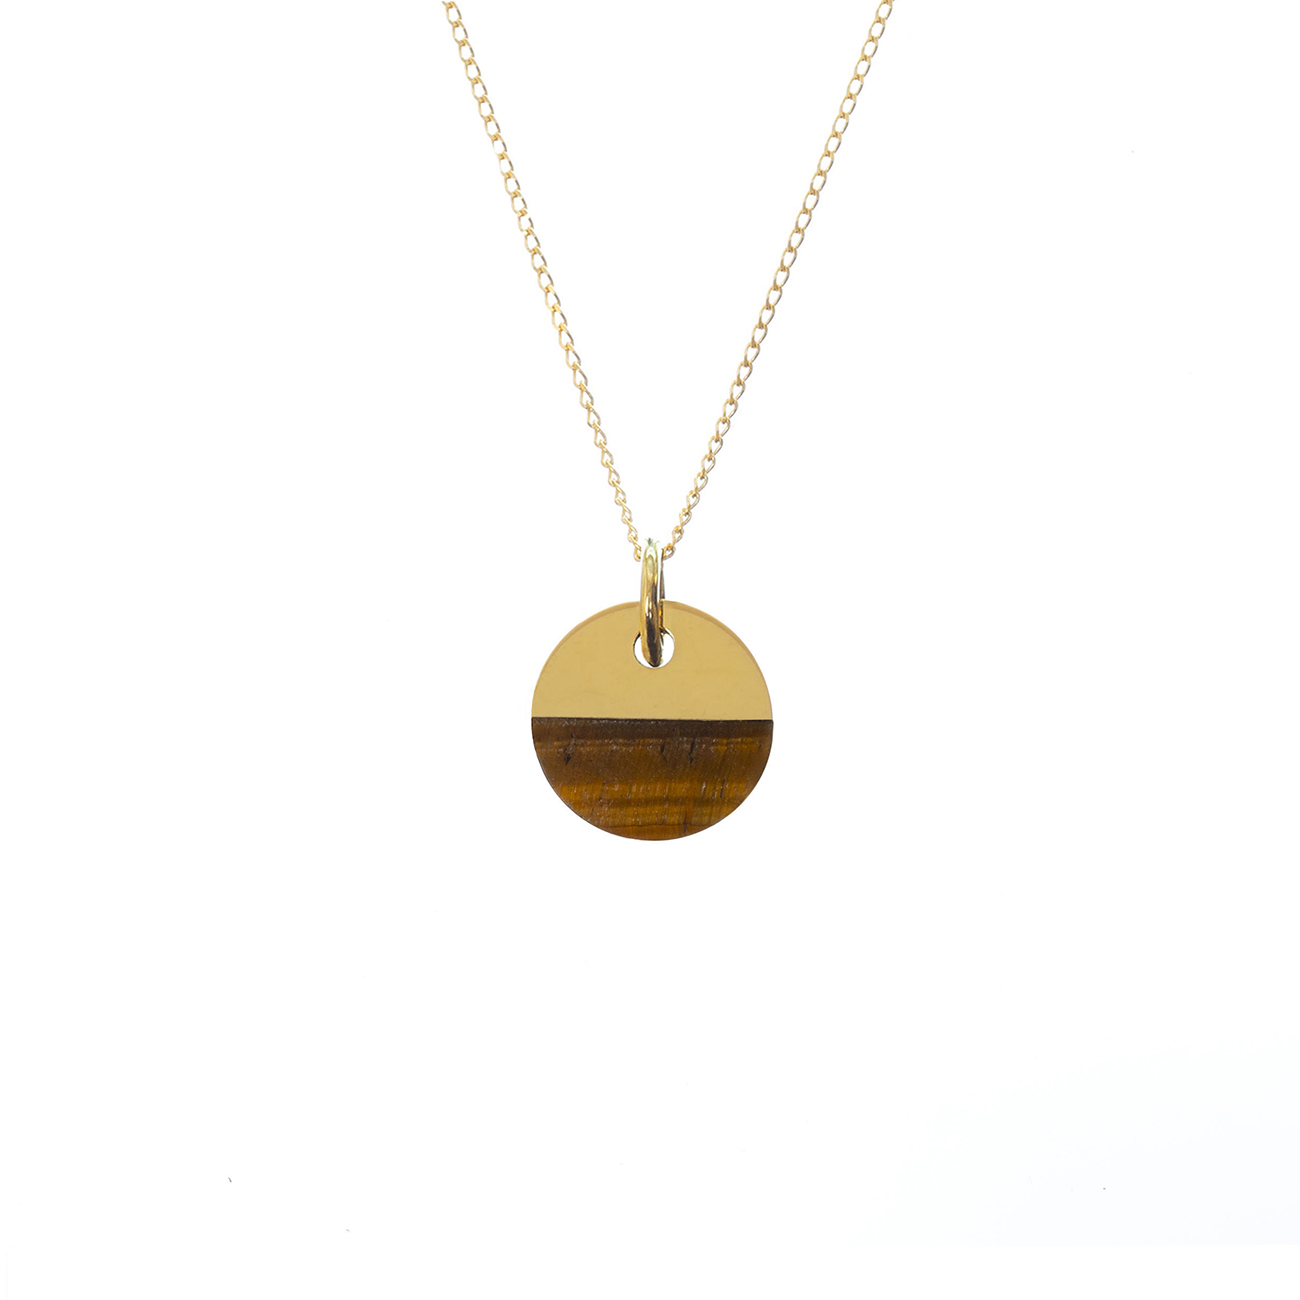 metaformi_design_jewelry_split_round_necklace_tiger_eye